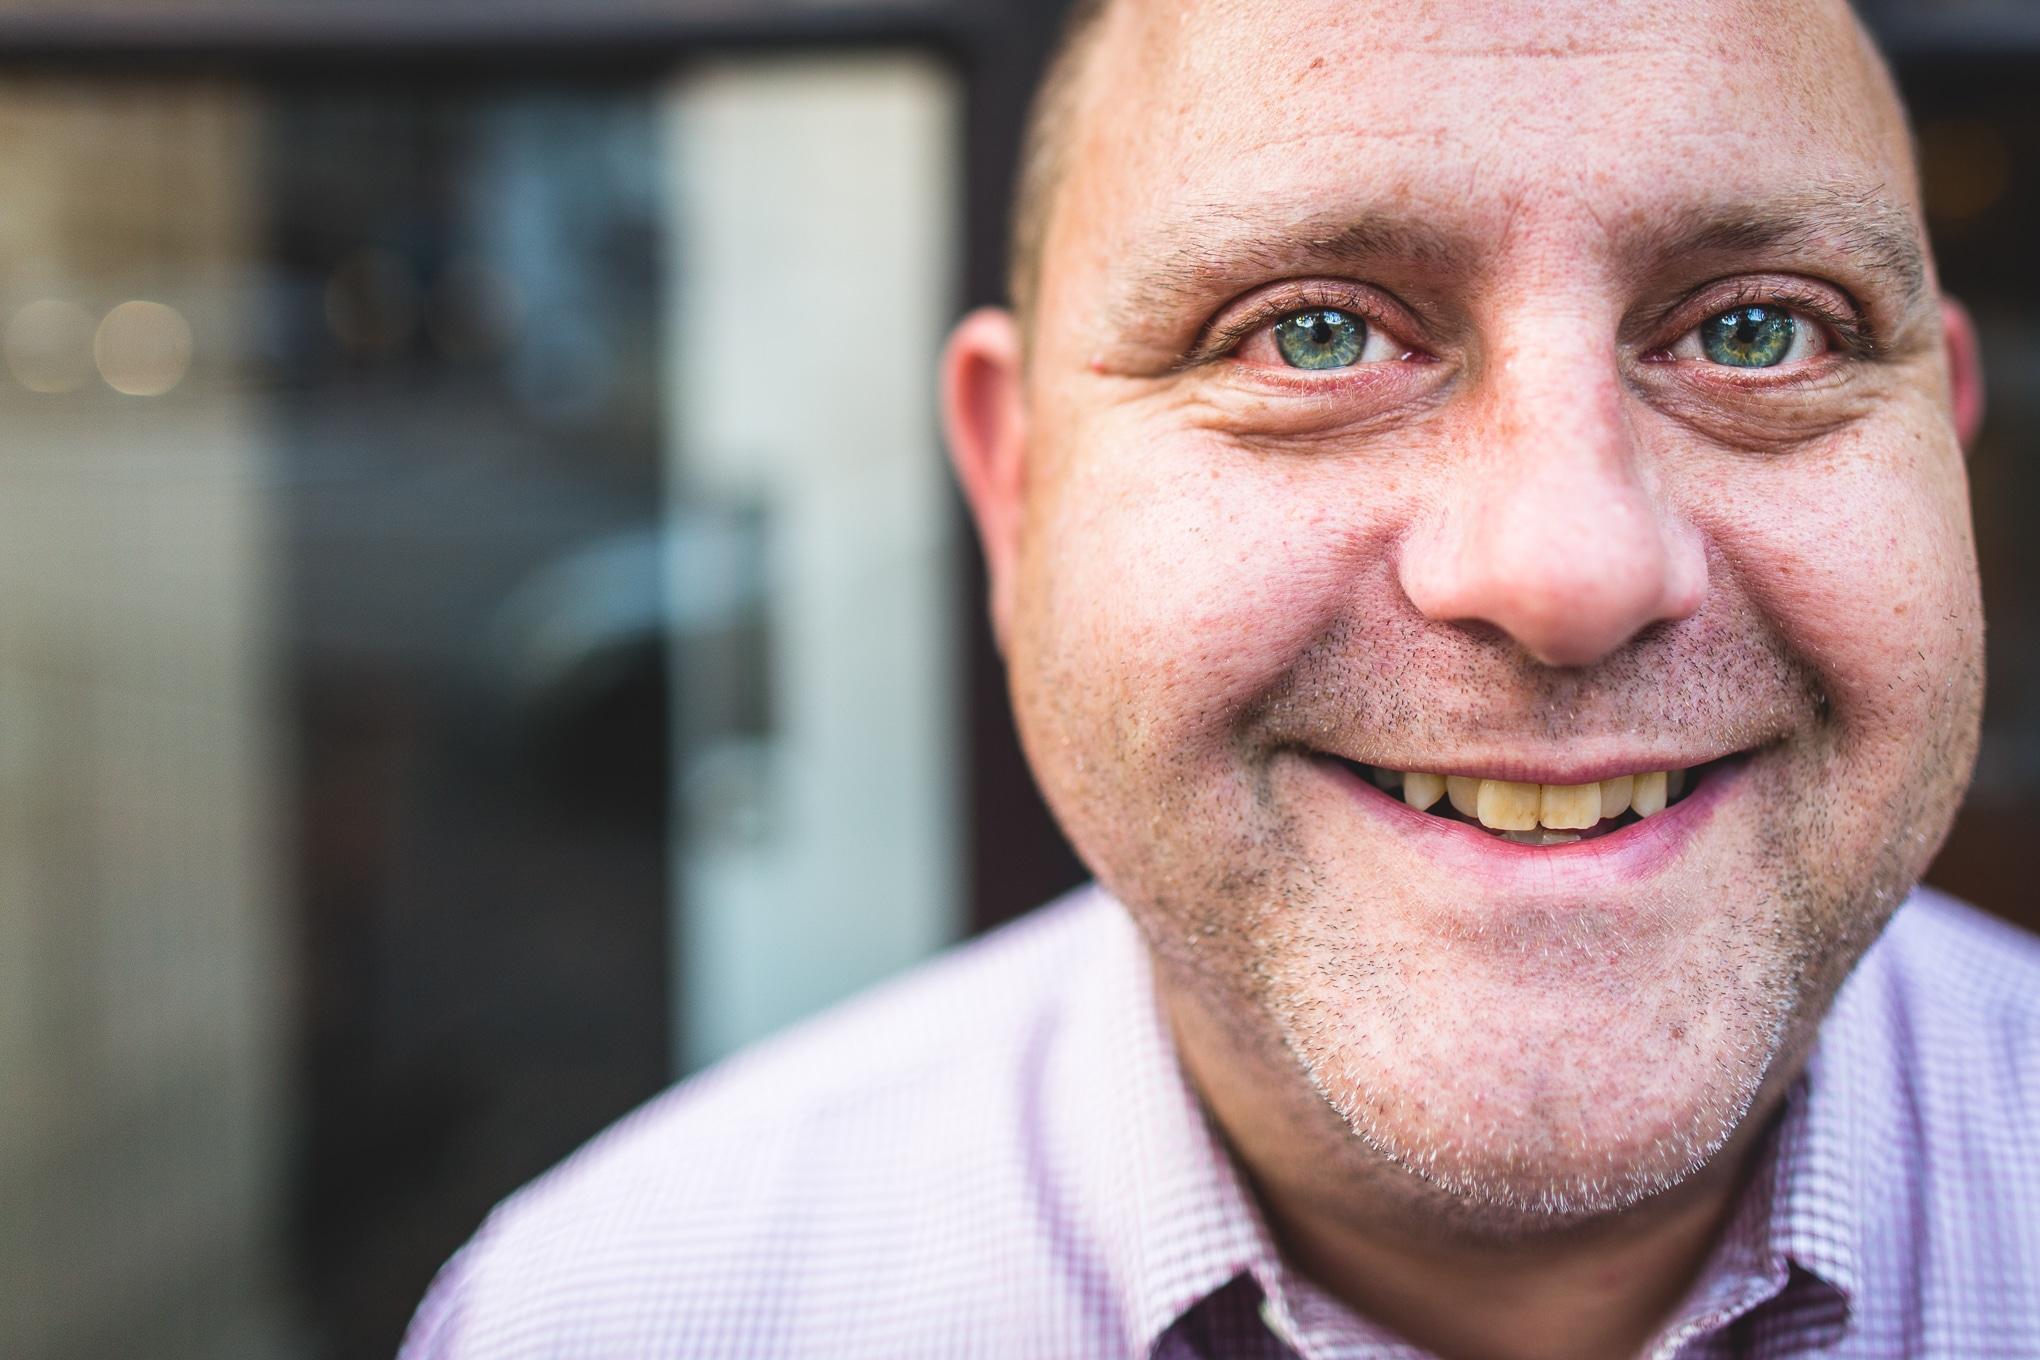 A man smiles at documentary photographer Simon Hawkins in memphis USA